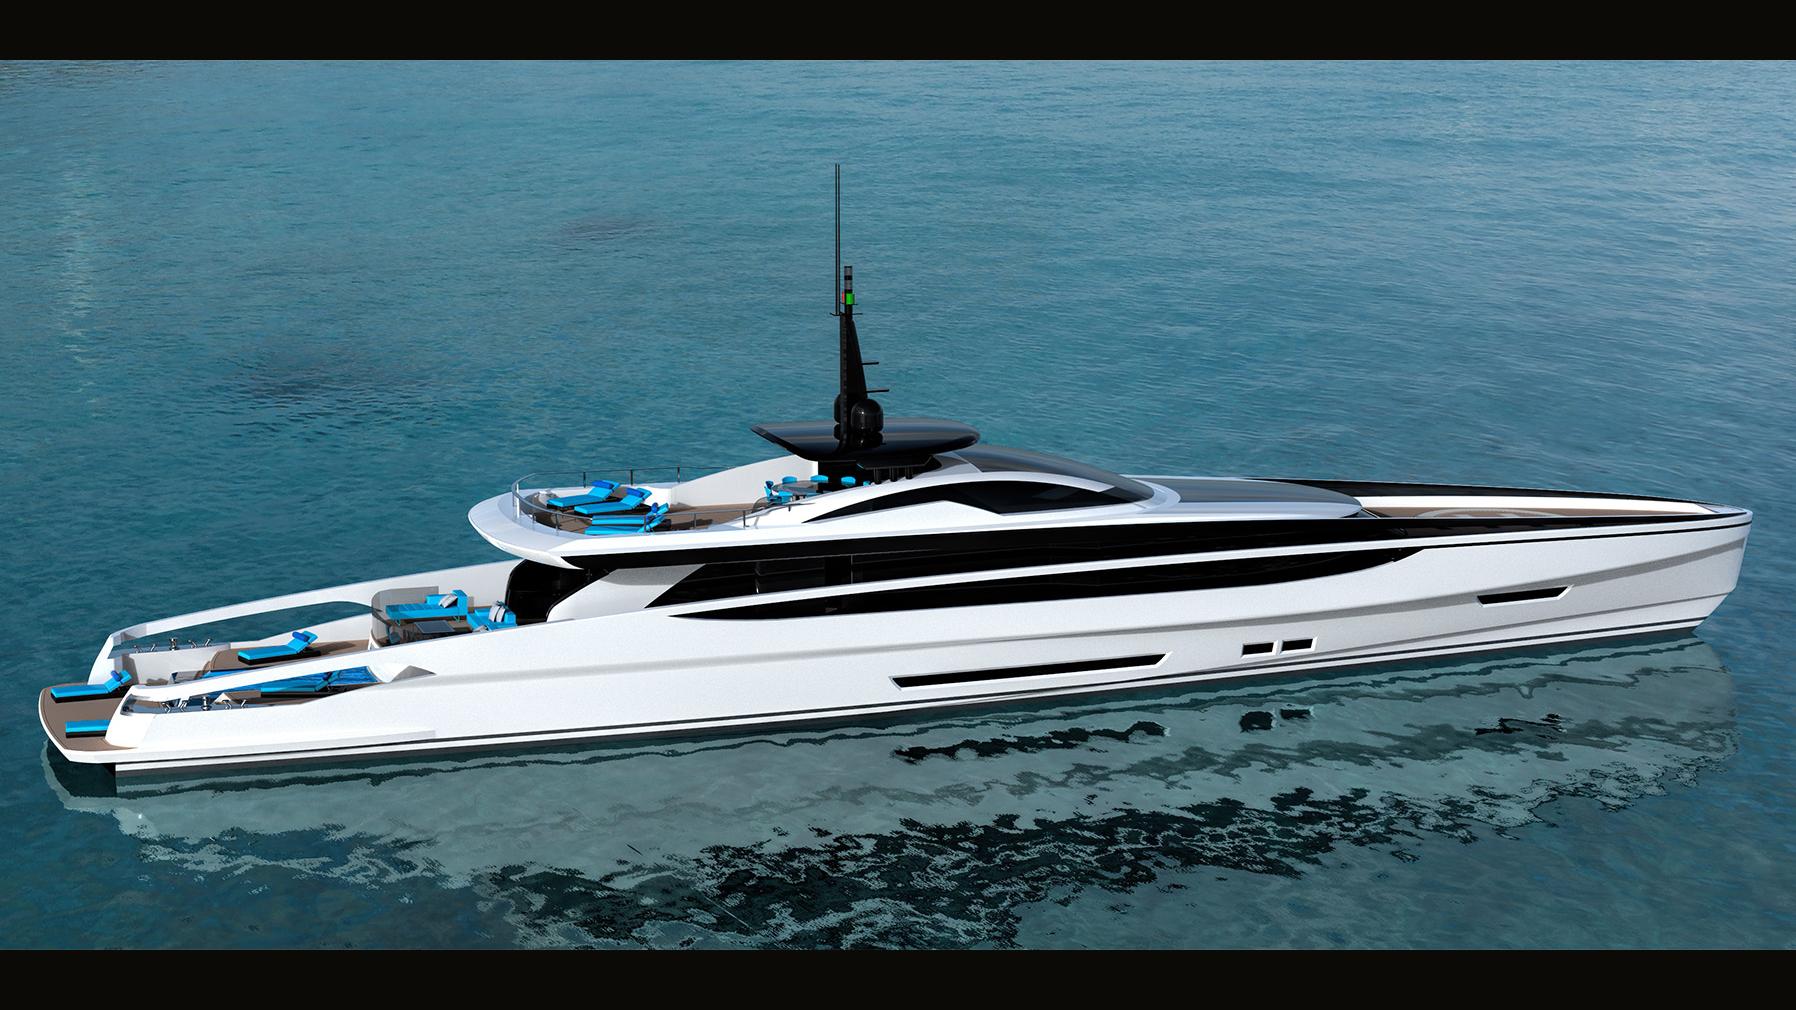 Ocean Independence Van Oossanen Federico Fiorentino Fast Displacement XL-300 superyacht concept